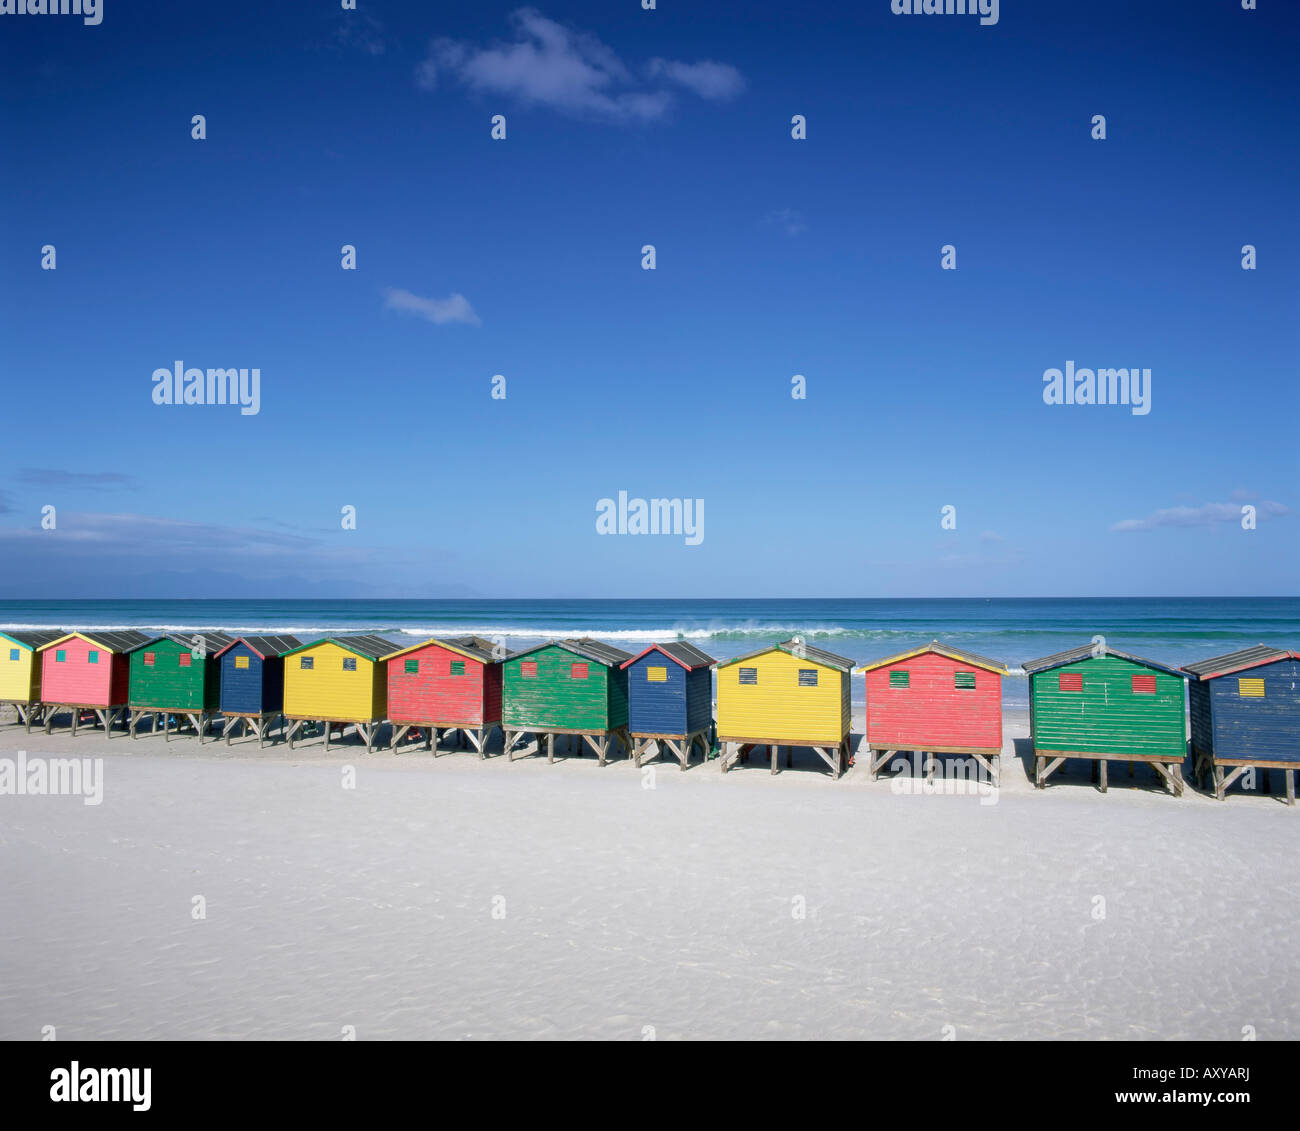 Colourful beach huts in Muizenberg, Cape Town, Cape Peninsula, South Africa, Africa - Stock Image